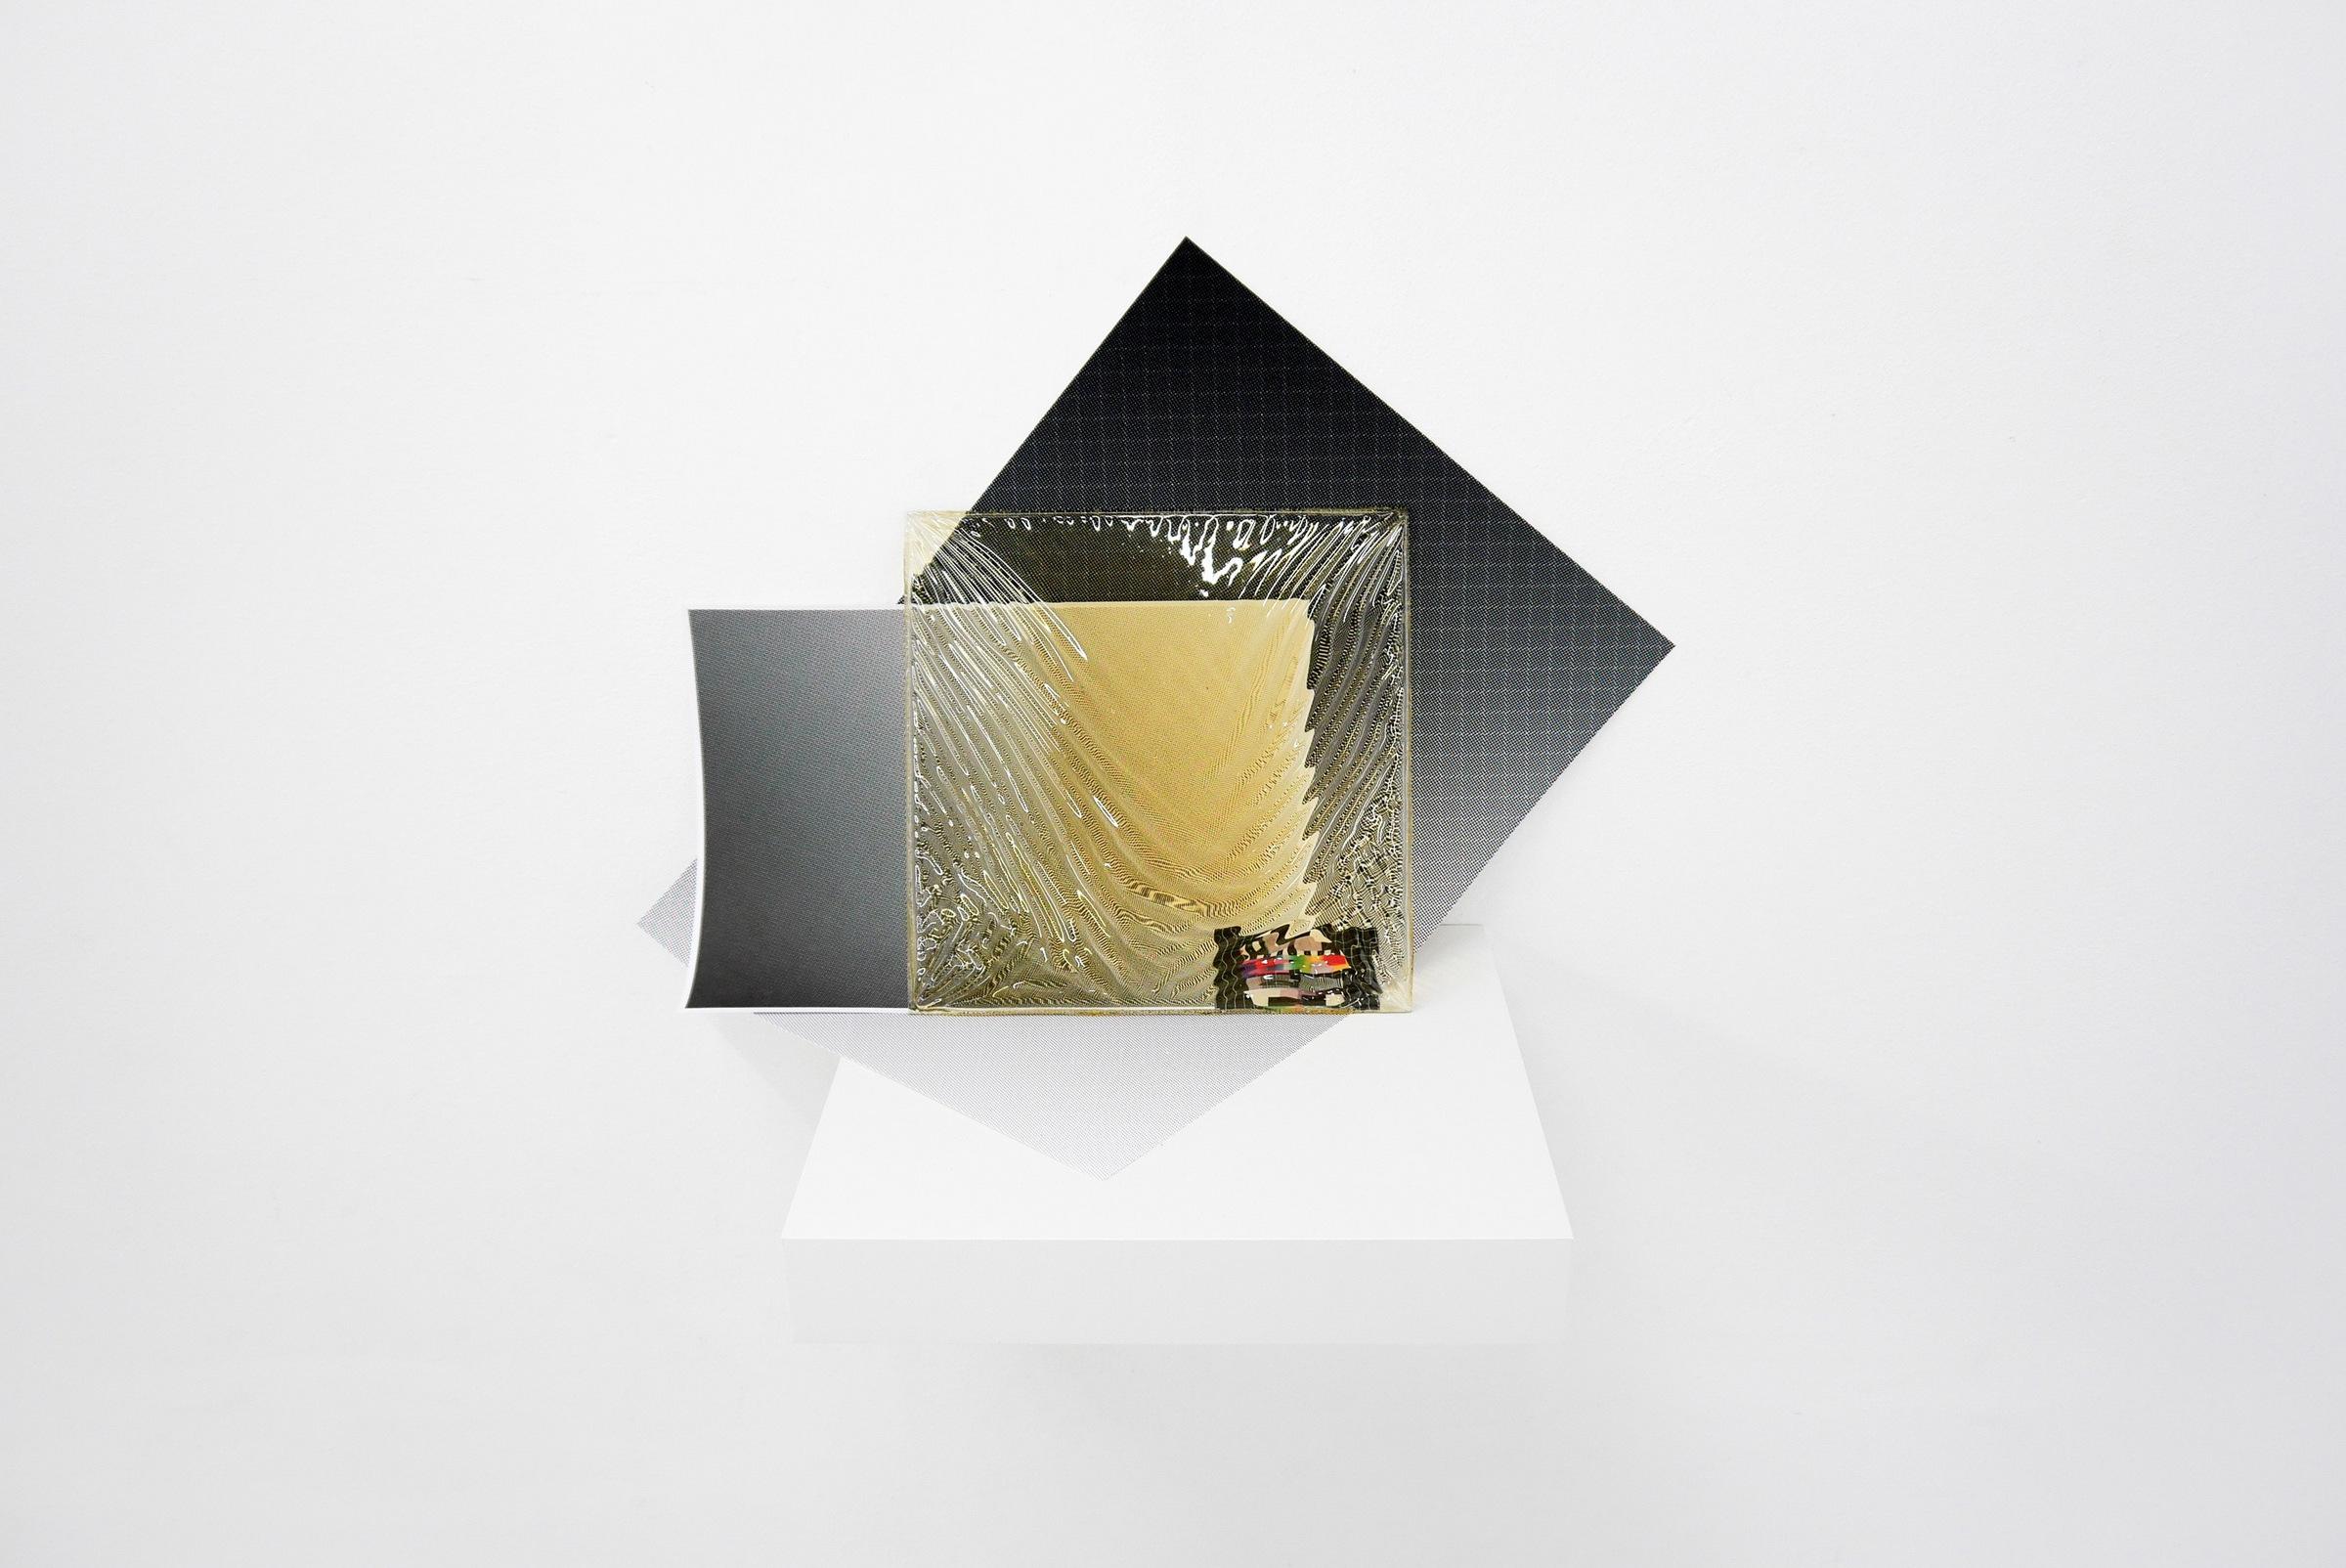 Distorting Filter, 2016, variable size, inkjet prints, glass, enamel, polaroid photo